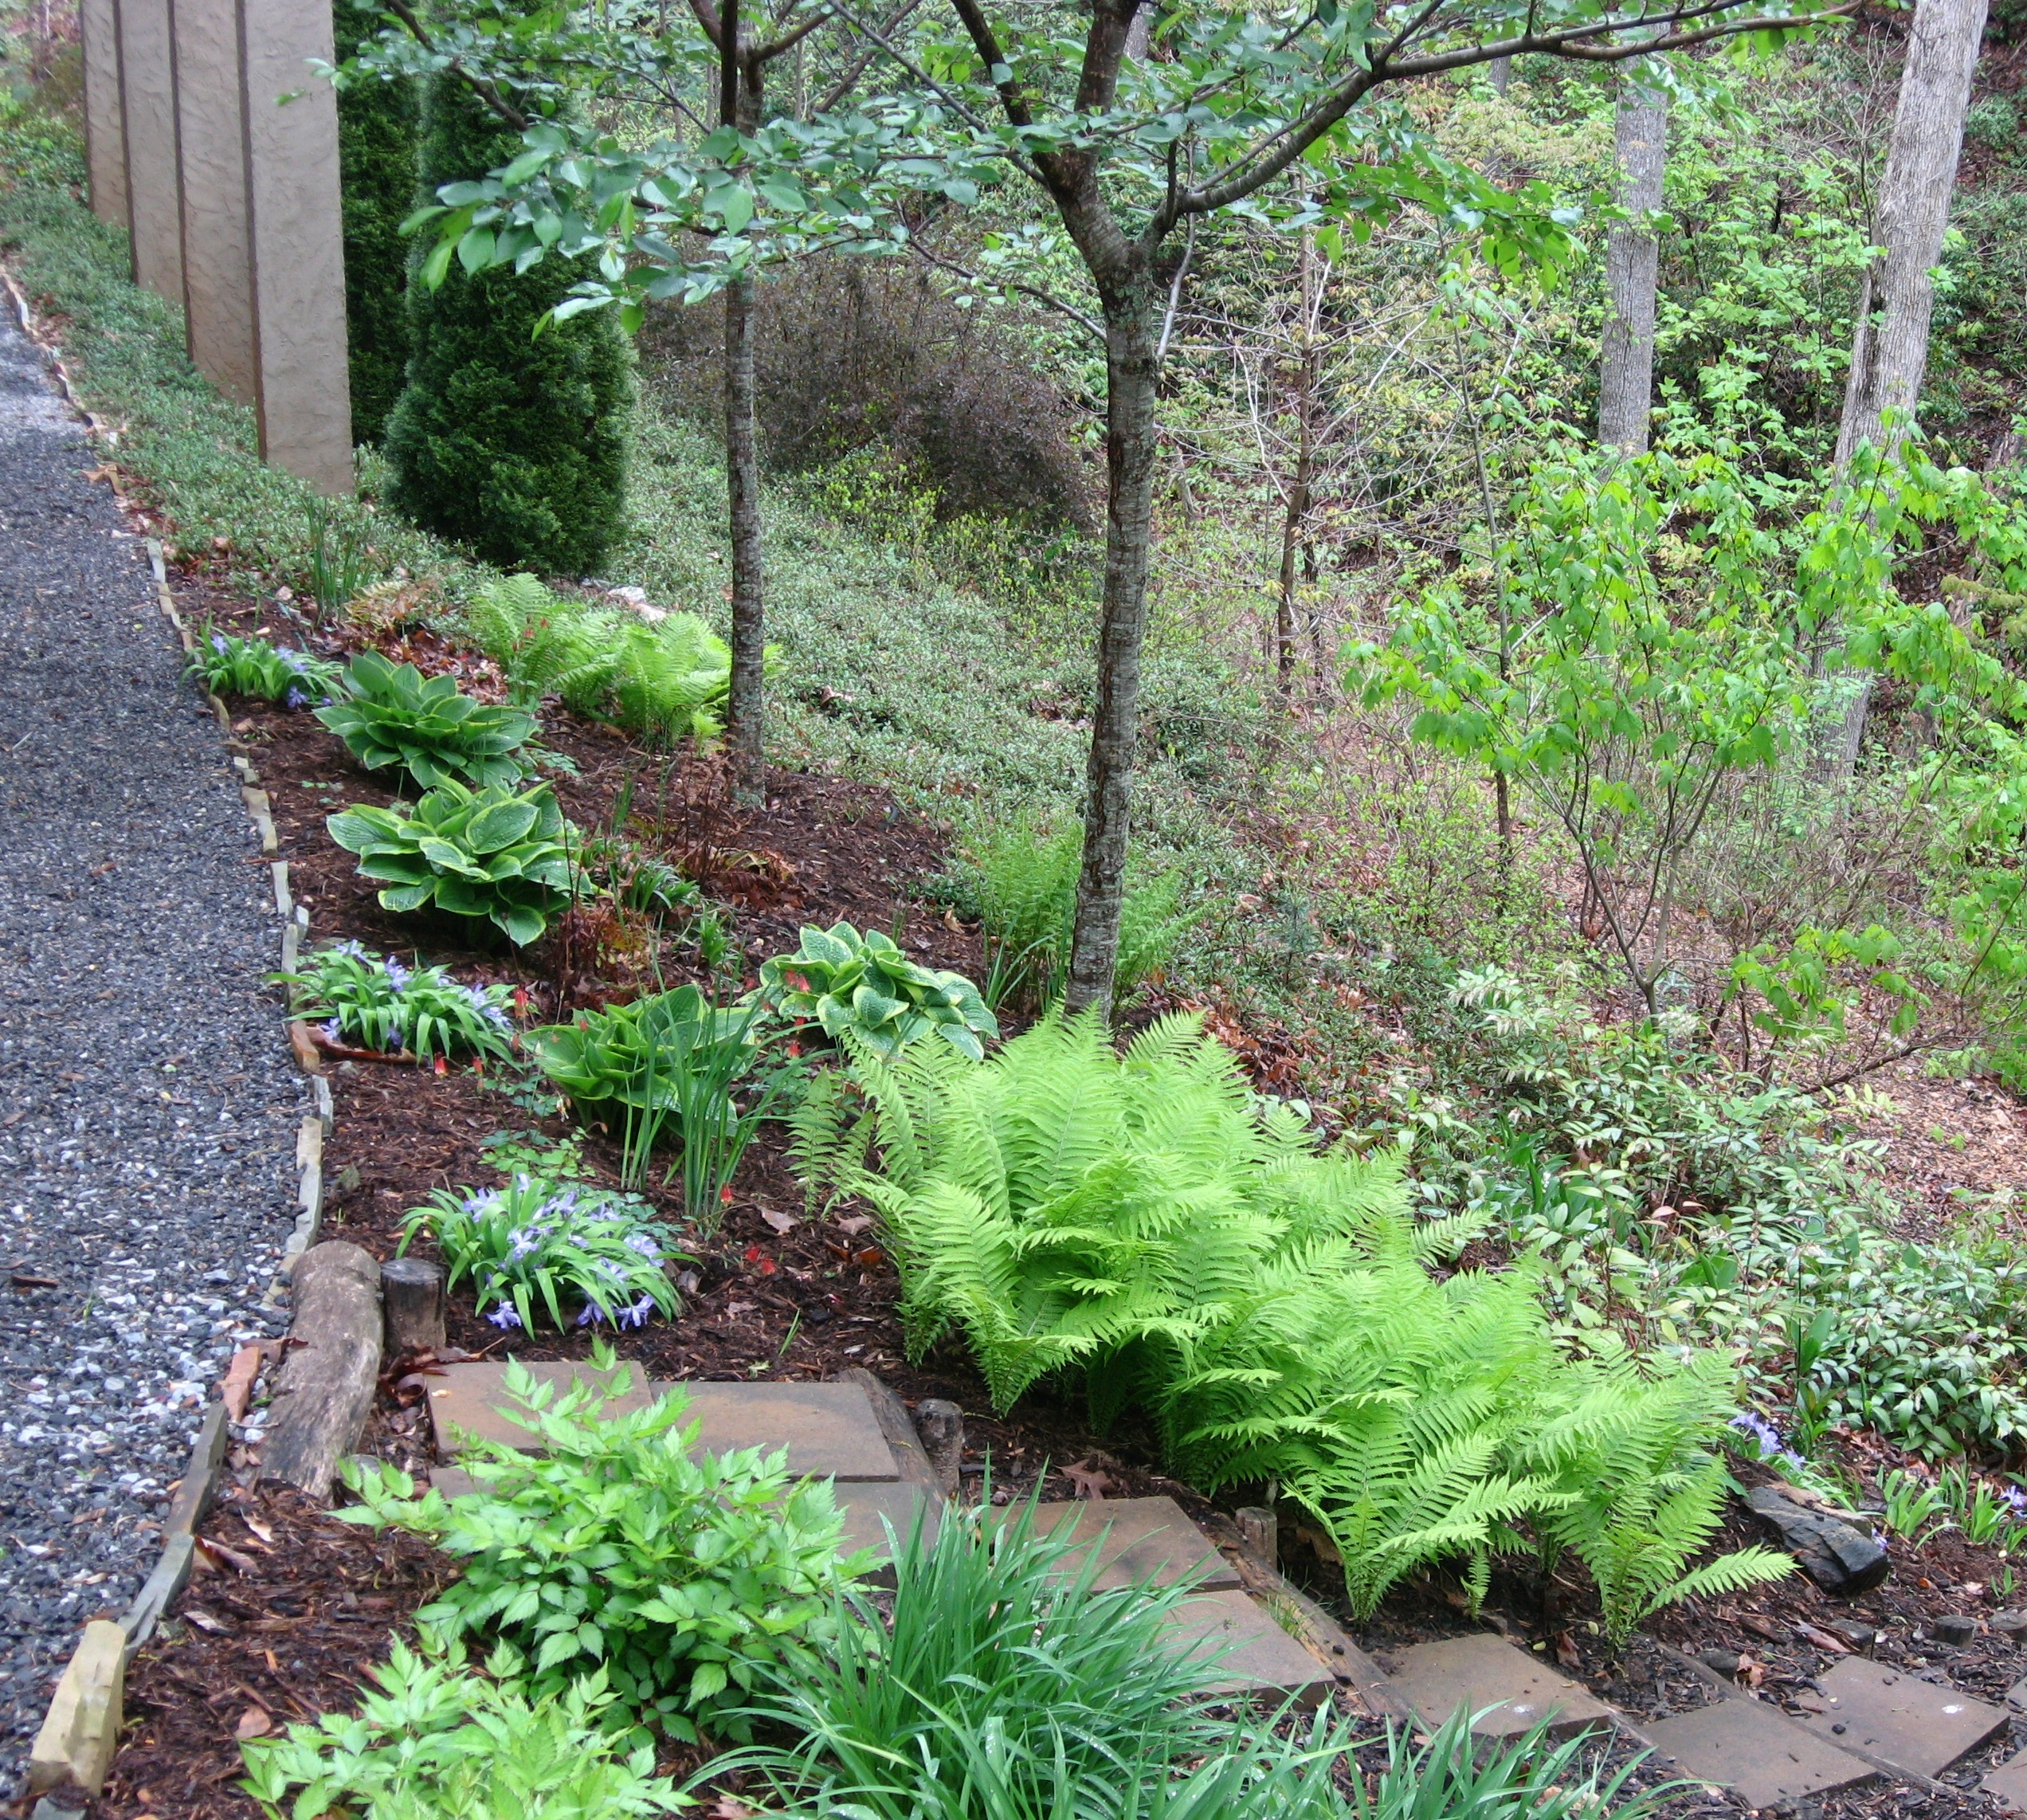 Garden Design For Sloped Garden Ideas: Extension Master Gardeners Of Buncombe County